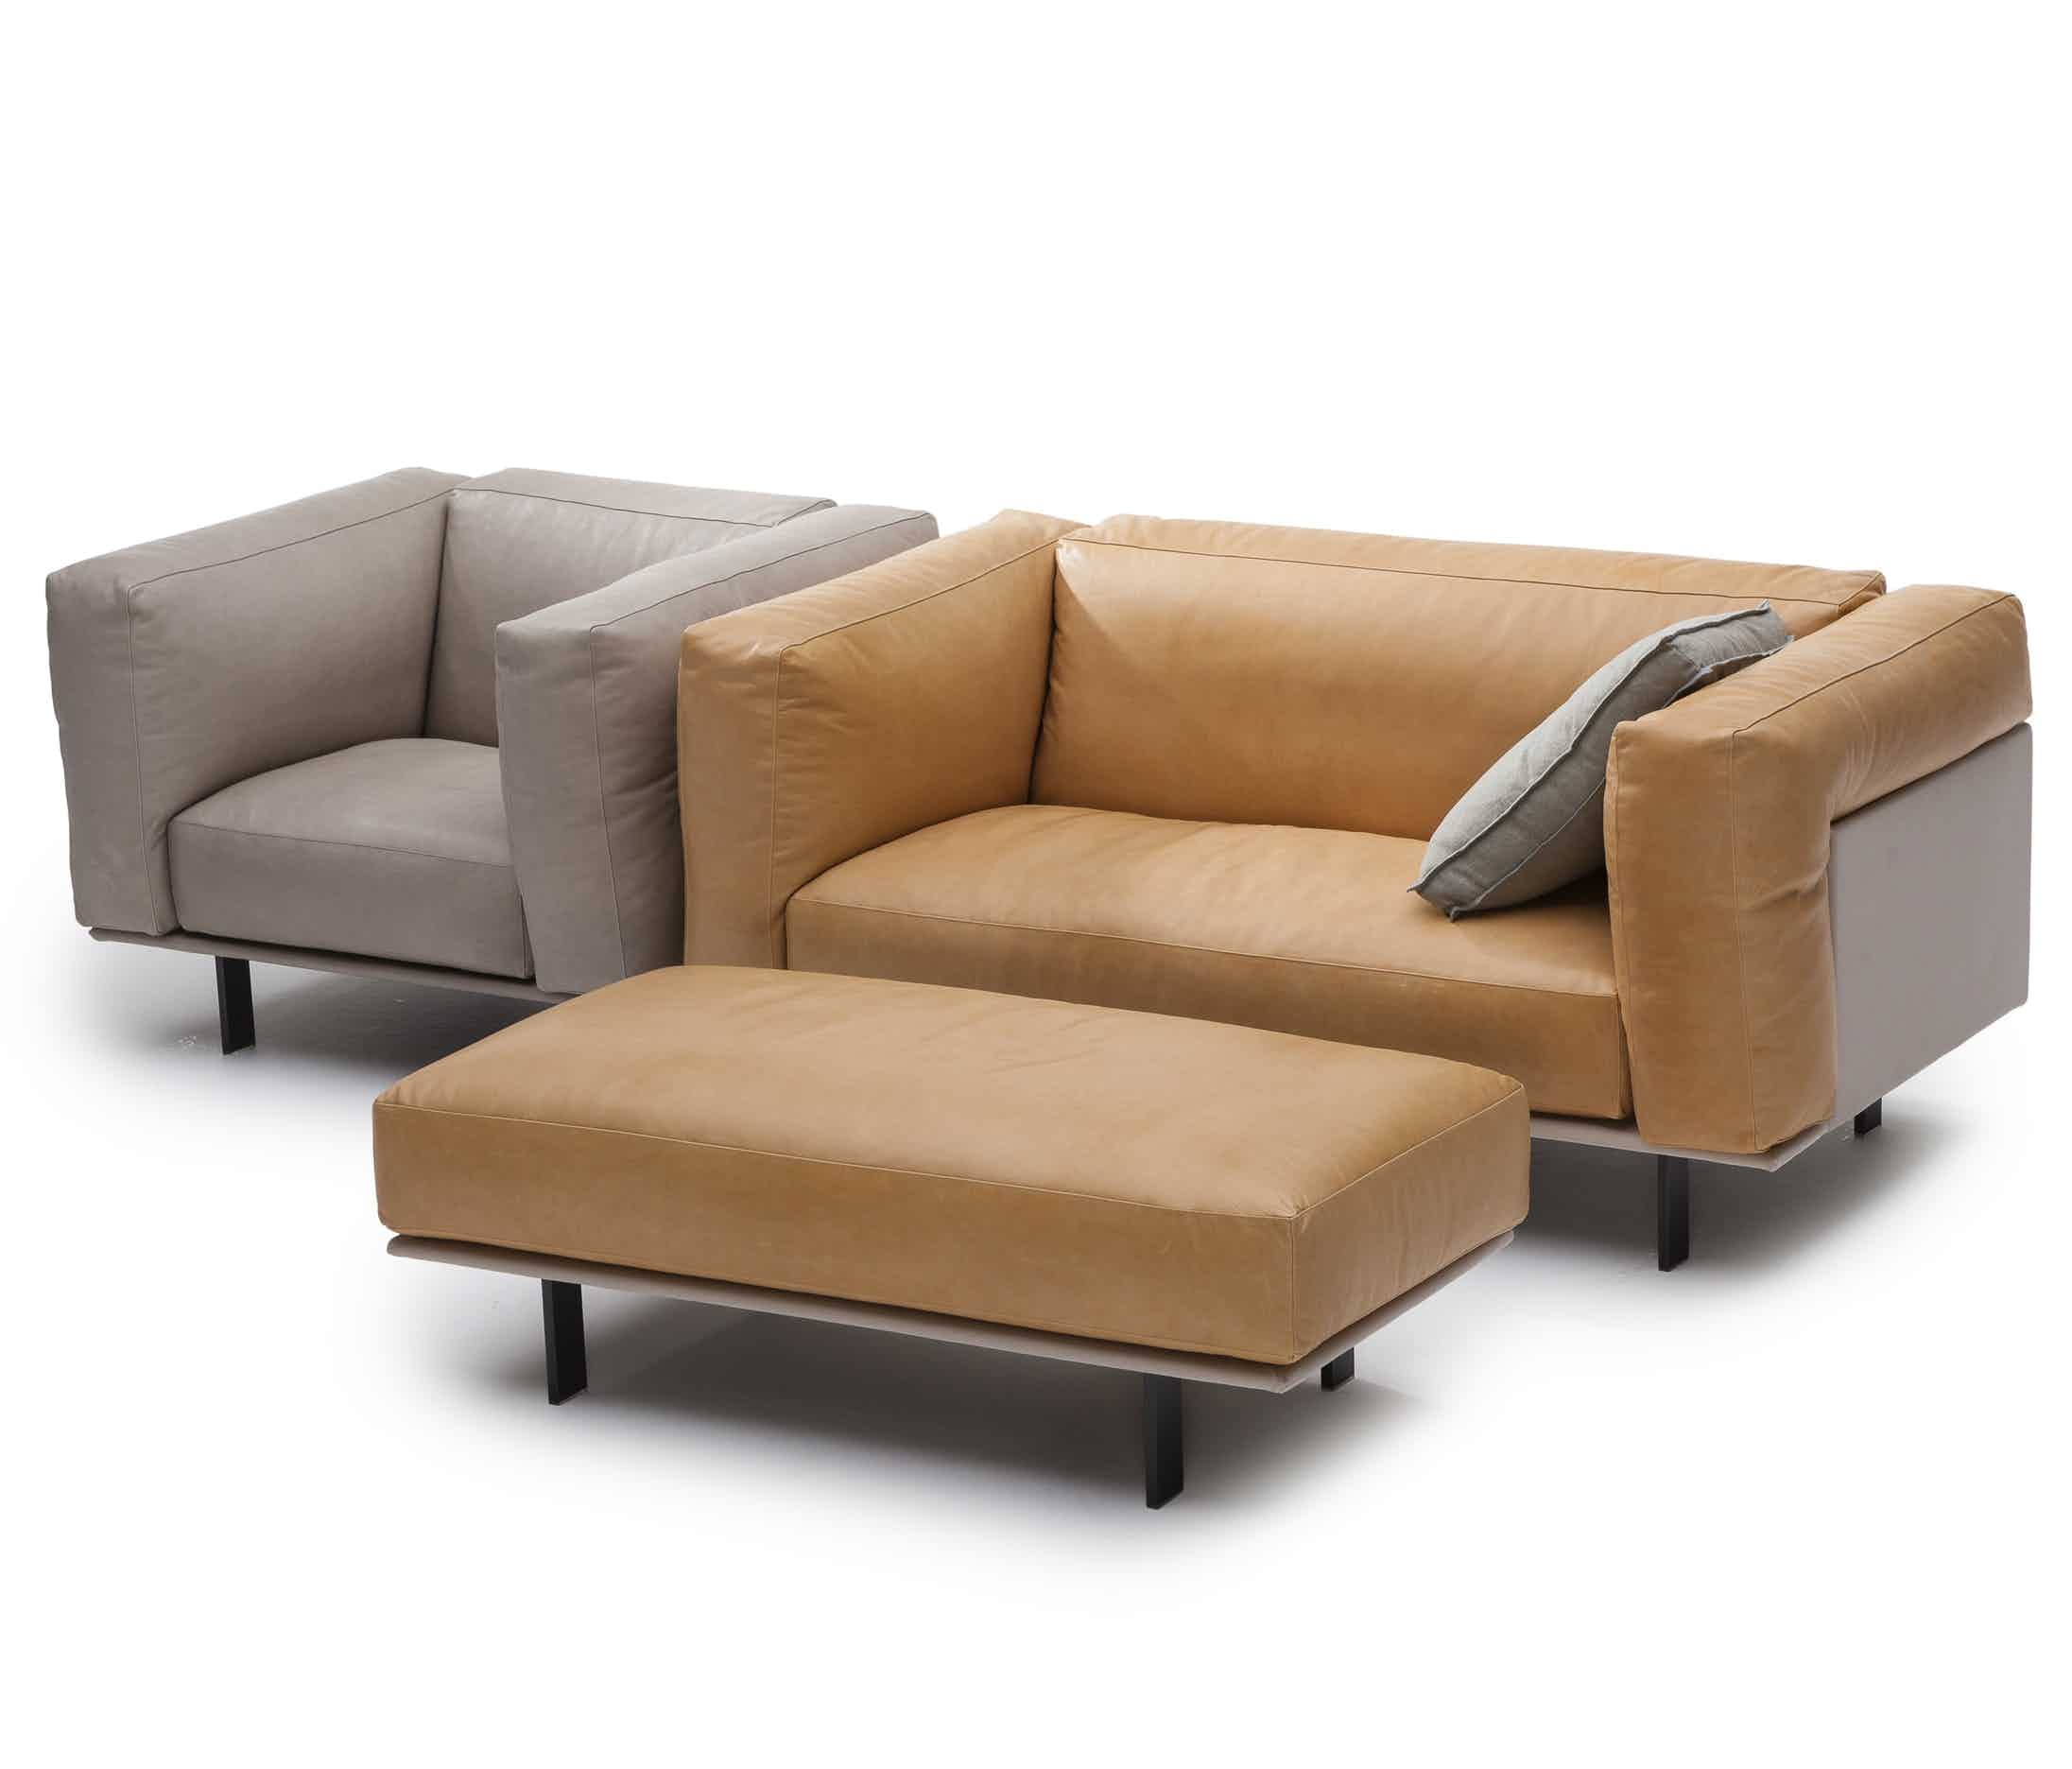 Linteloo-collection-recess-sofa-haute-living